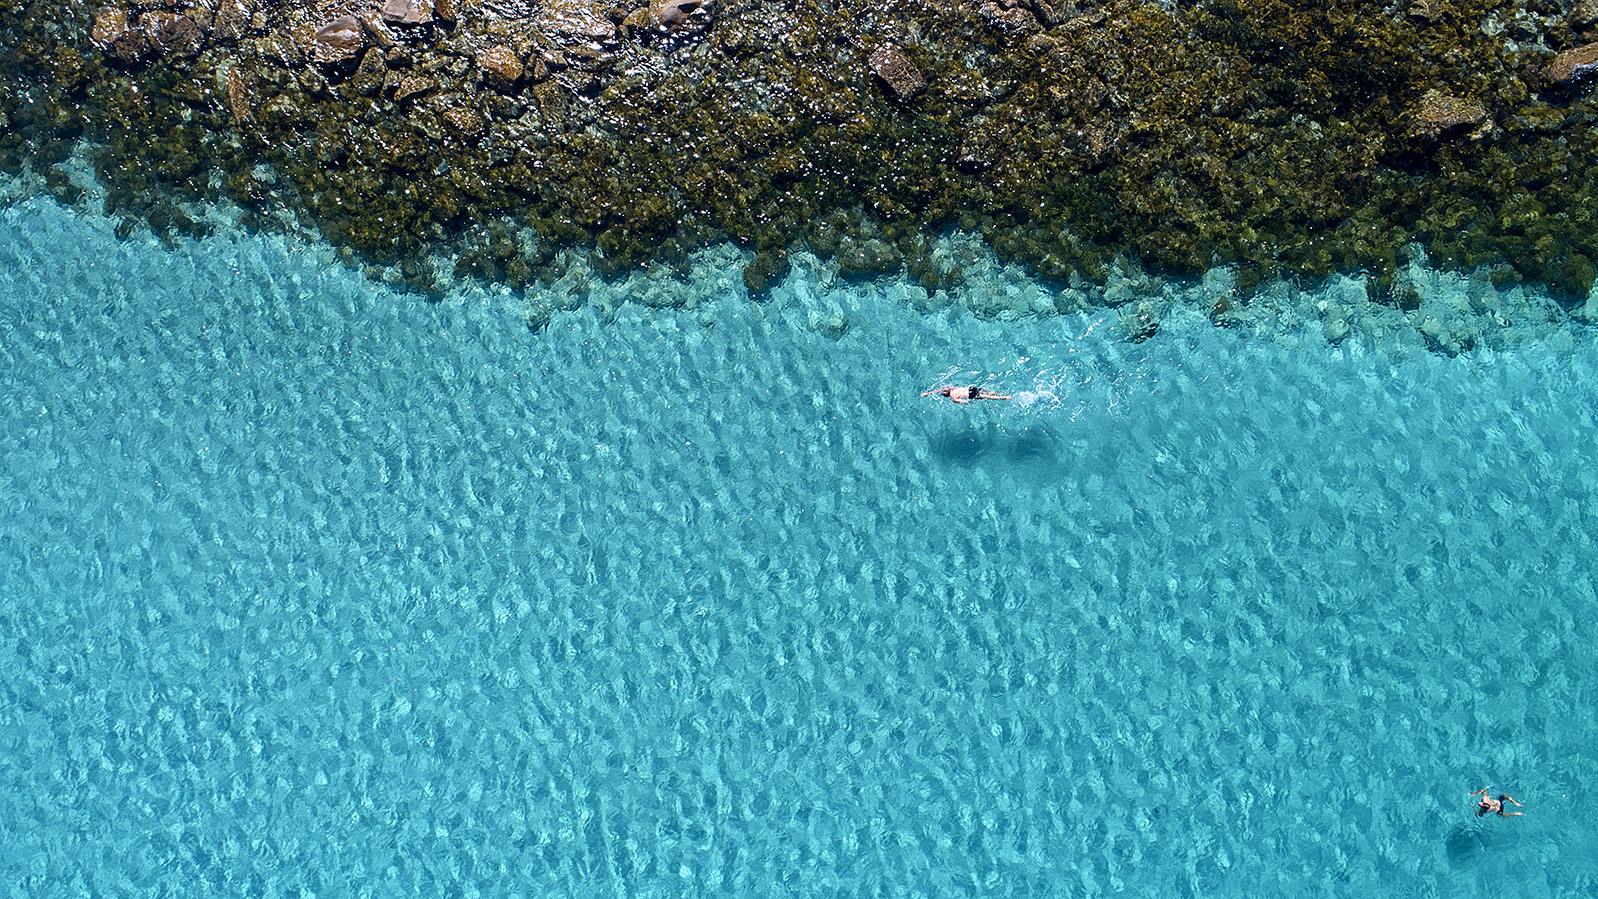 026 - Jason Mazur - 'Swimmers, Geographe Bay, Dunsborough'